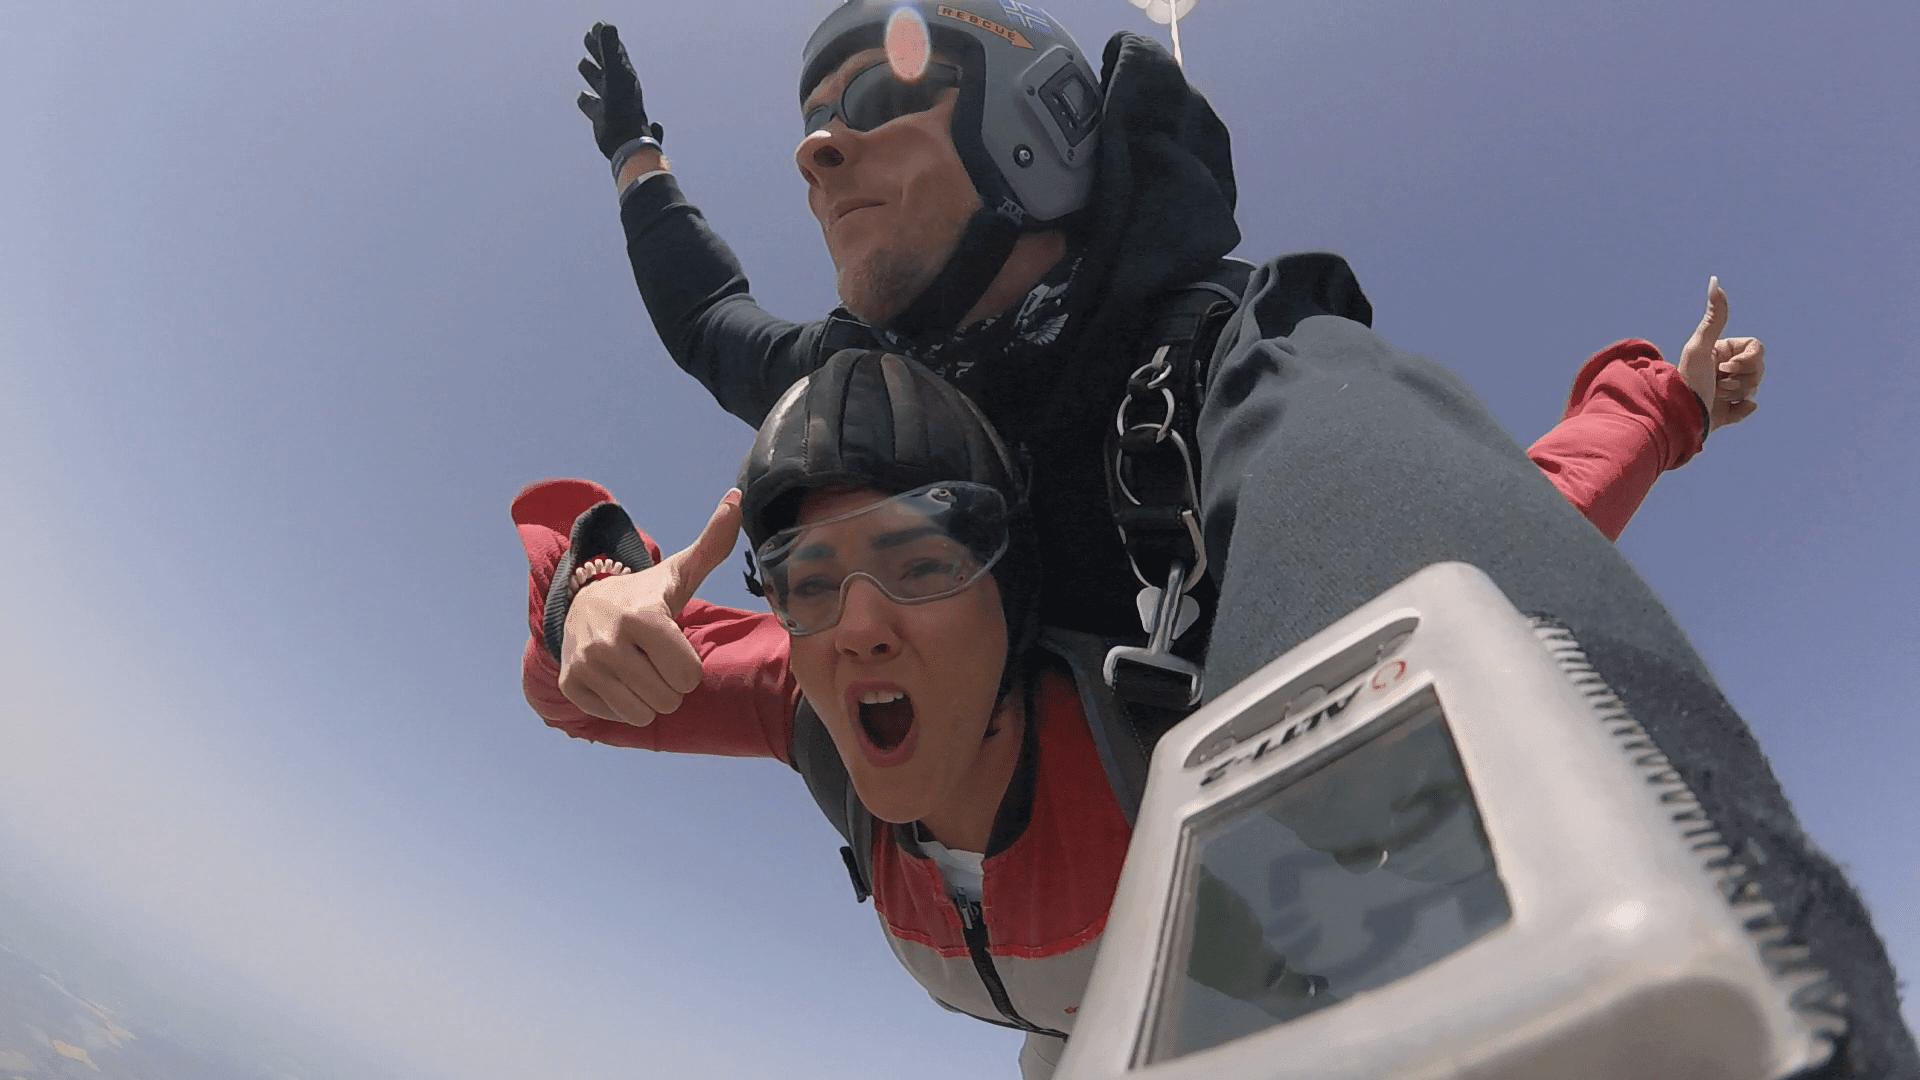 Bayern Fallschirm Tandemspringen 4300 Meter Höhe